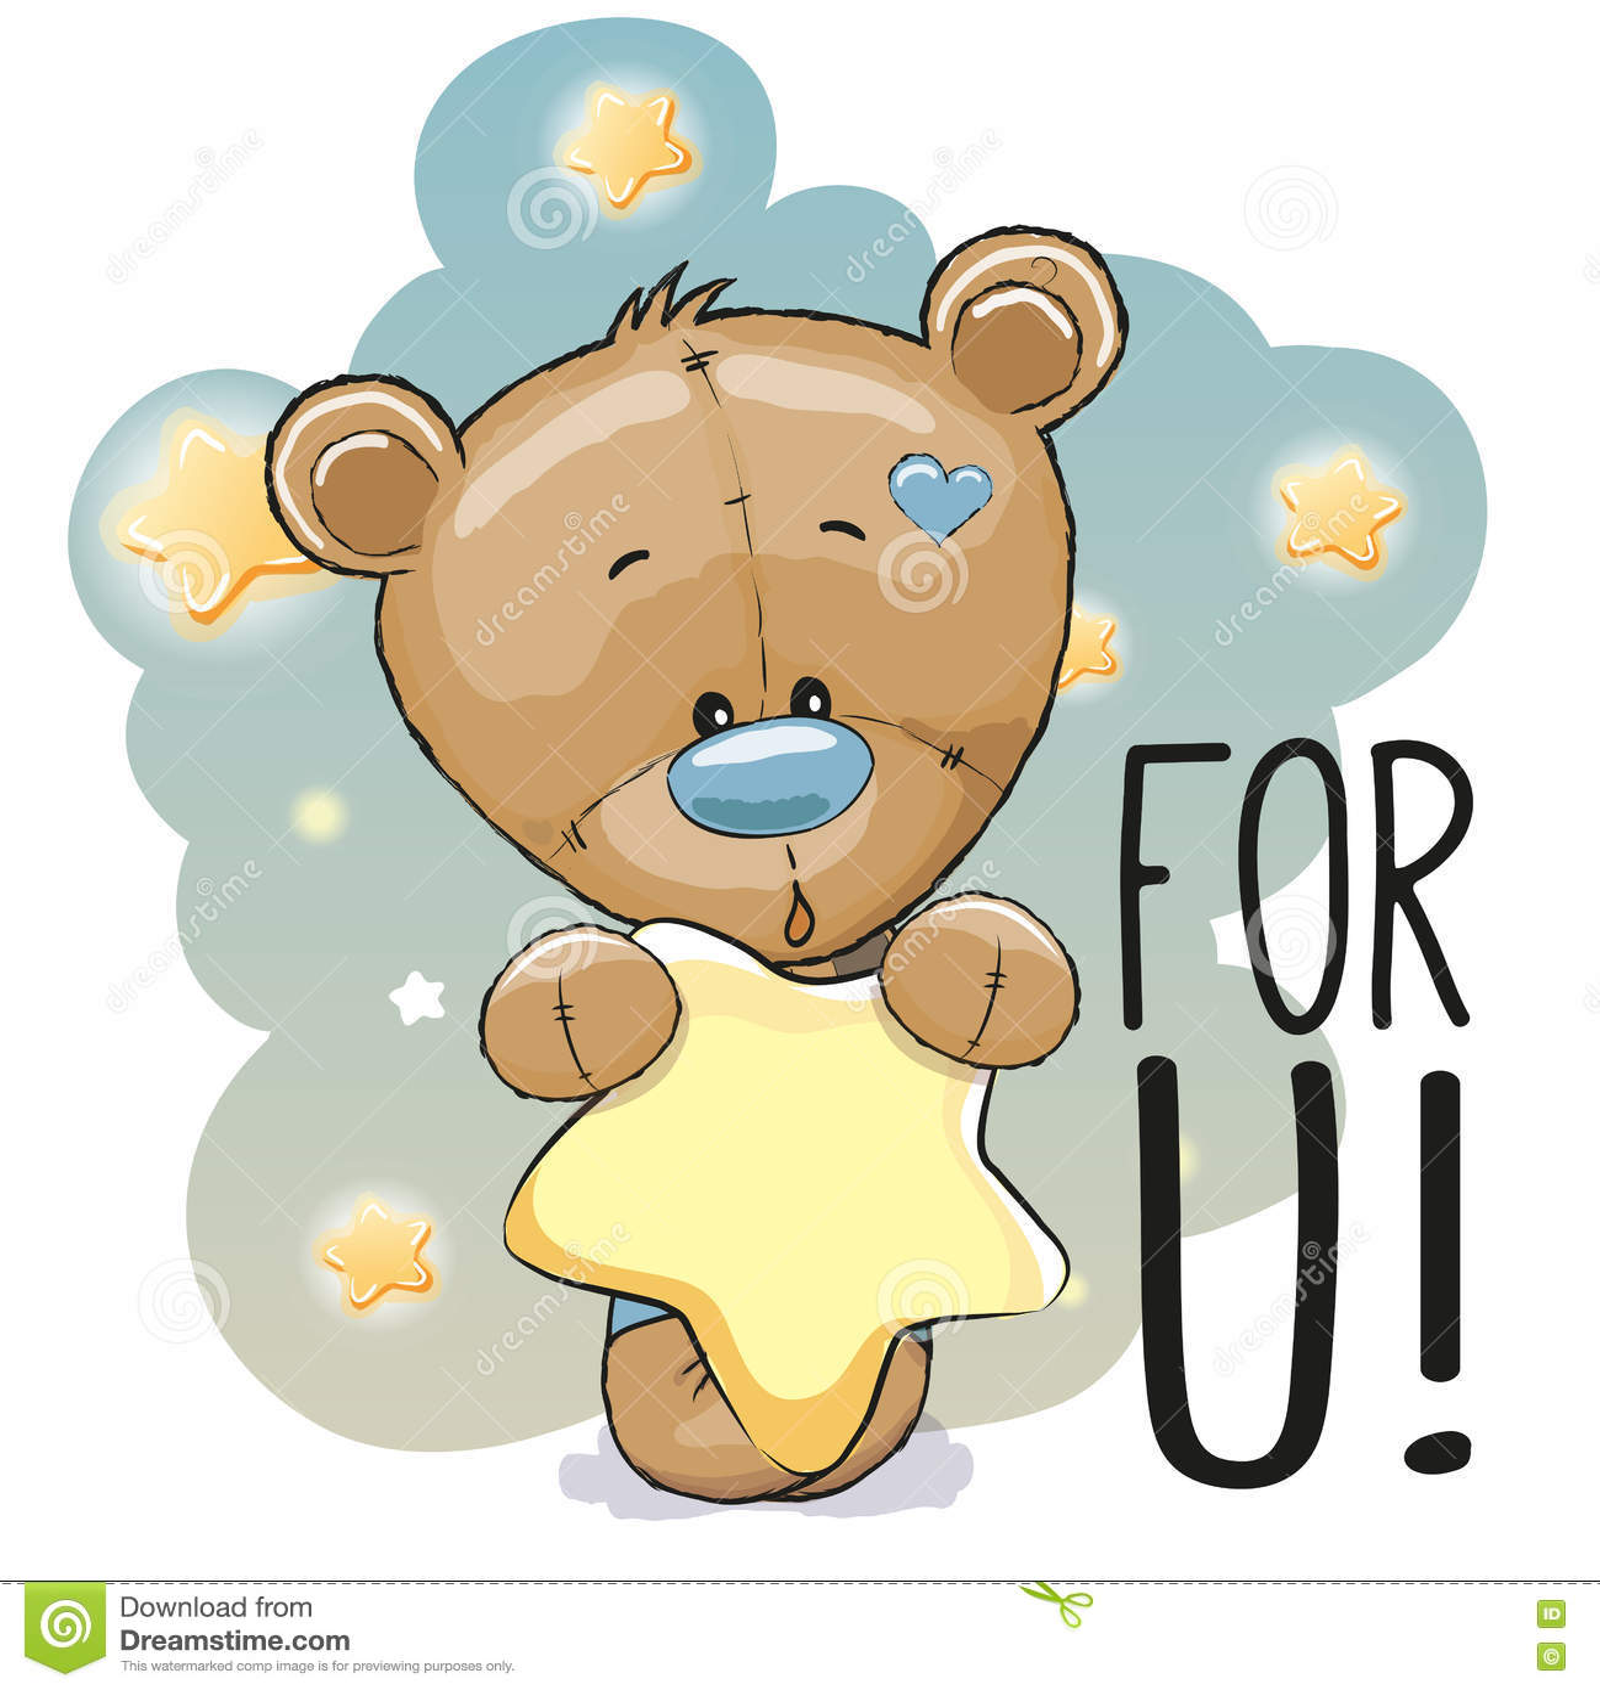 cute bear cartoon royalty free cartoon cartoondealer com Teddy Bear Baby Cub Teddy Bear Baby Cub